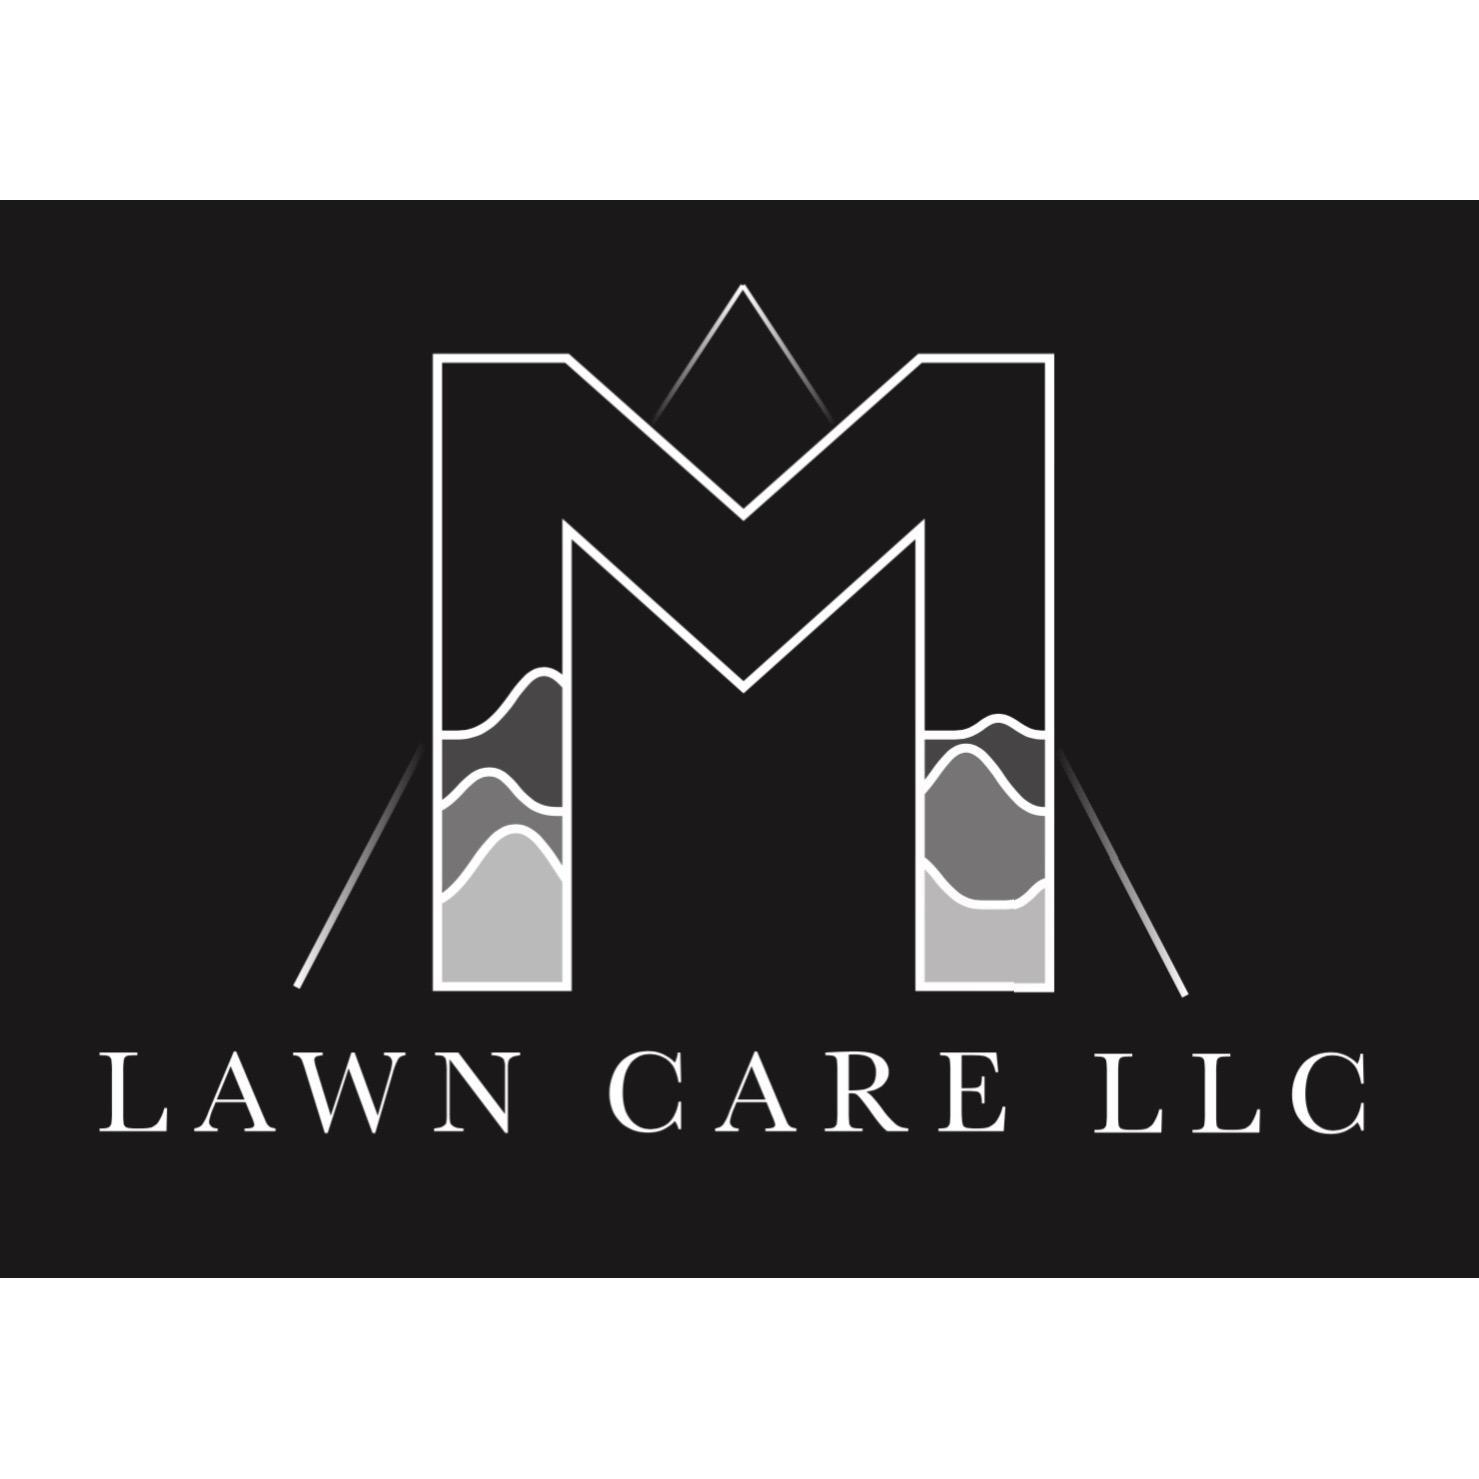 Mountain Lawn Care LLC